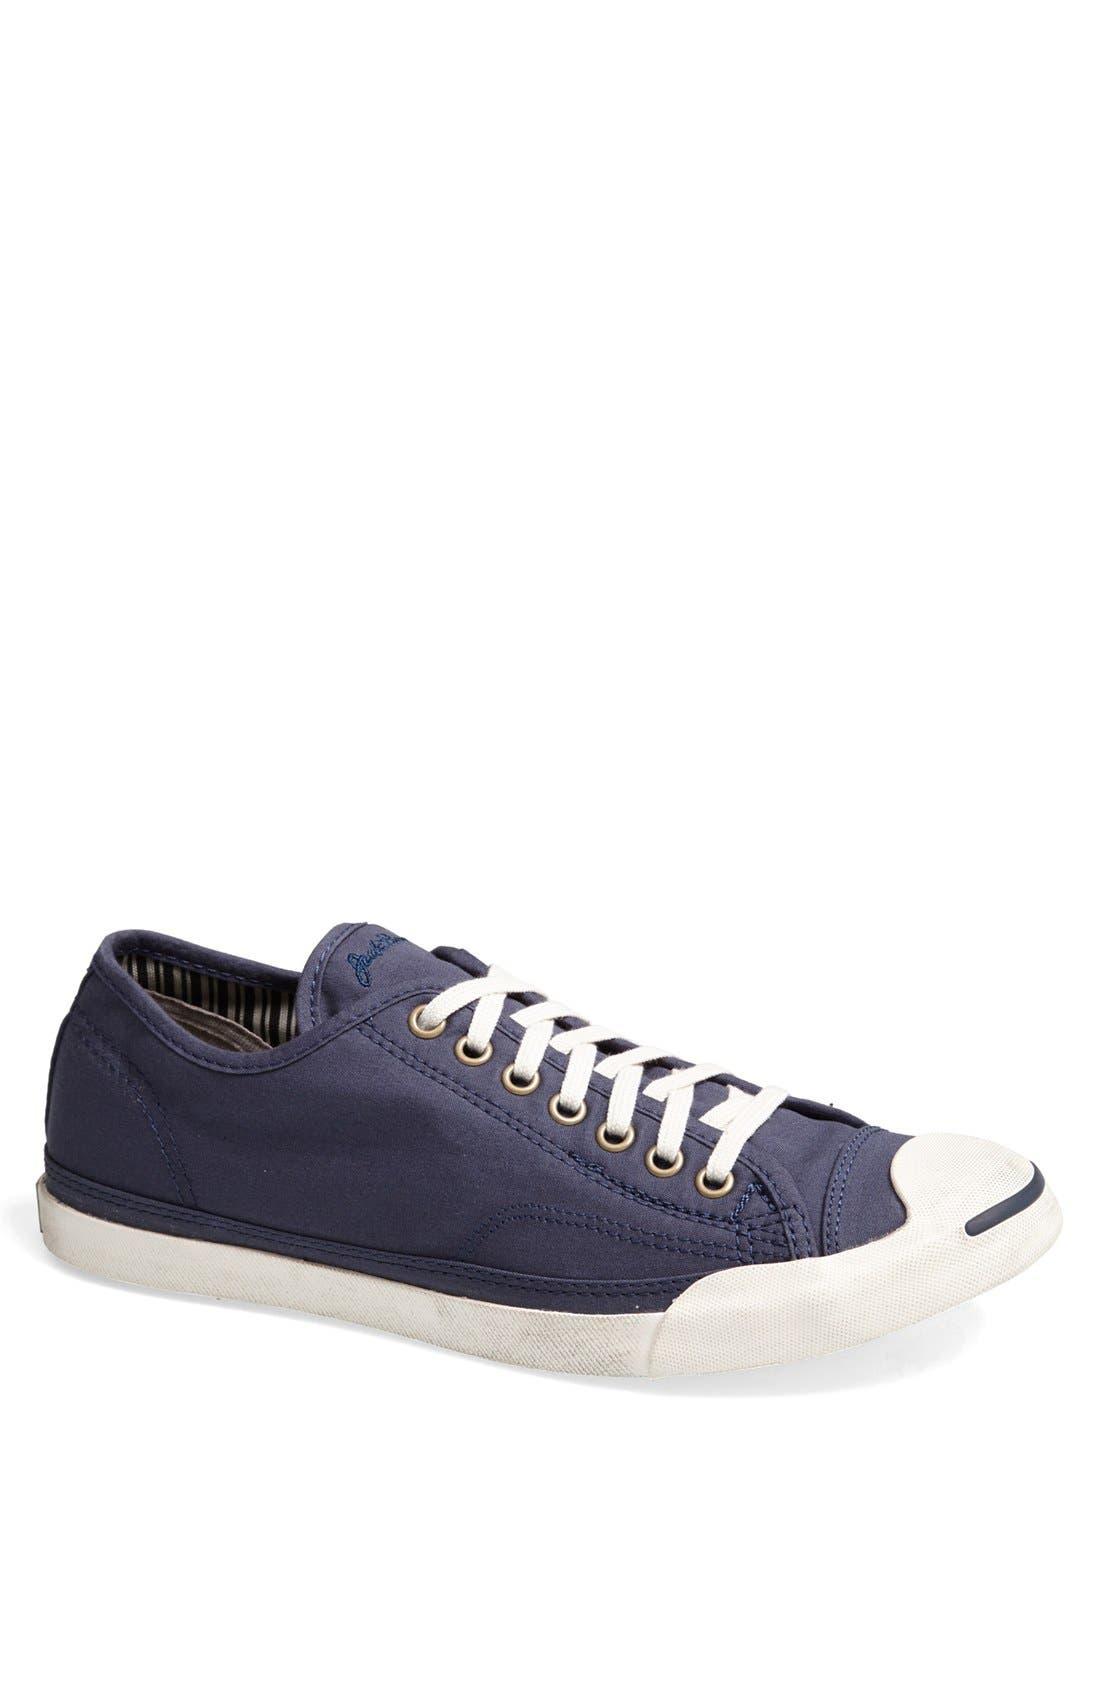 Main Image - Converse 'Jack Purcell - Low' Sneaker (Men)